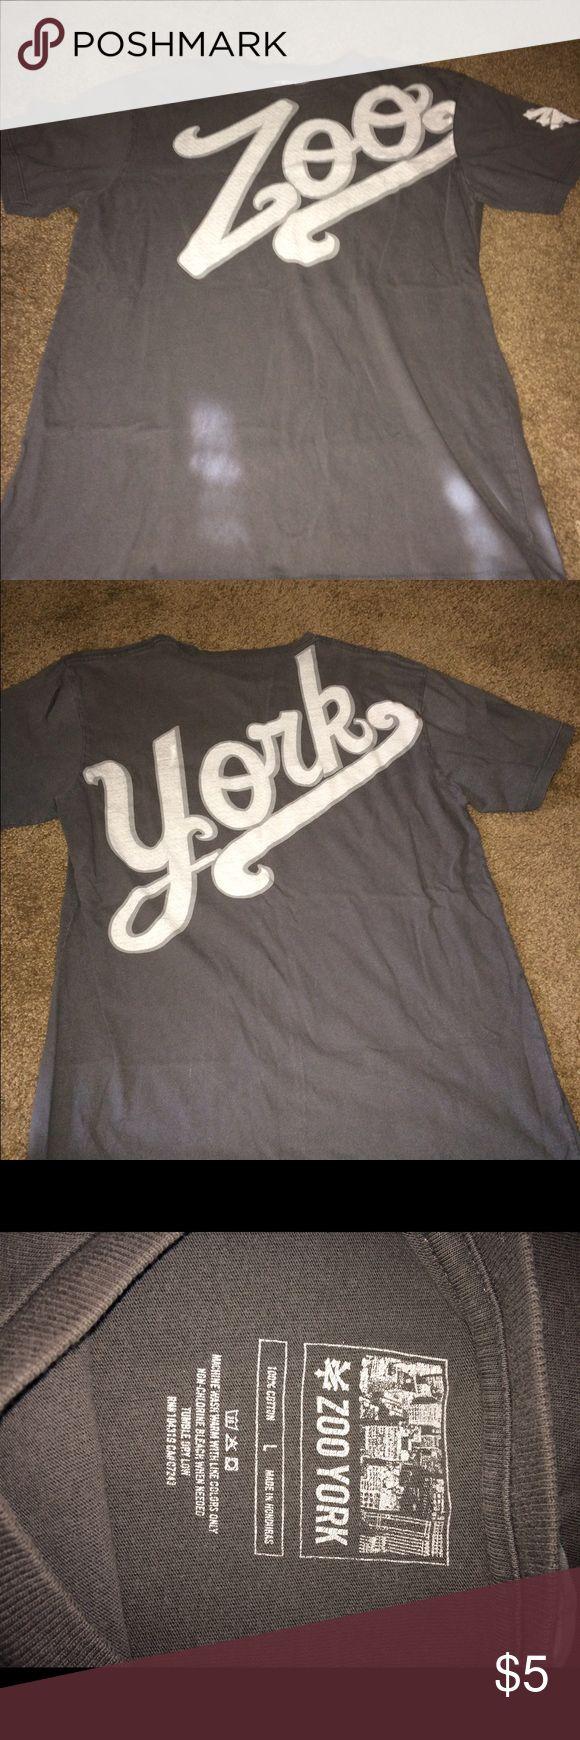 Zoo York t shirt 🎈 Size large gently worn, smoke free home Zoo York Shirts Tees - Short Sleeve